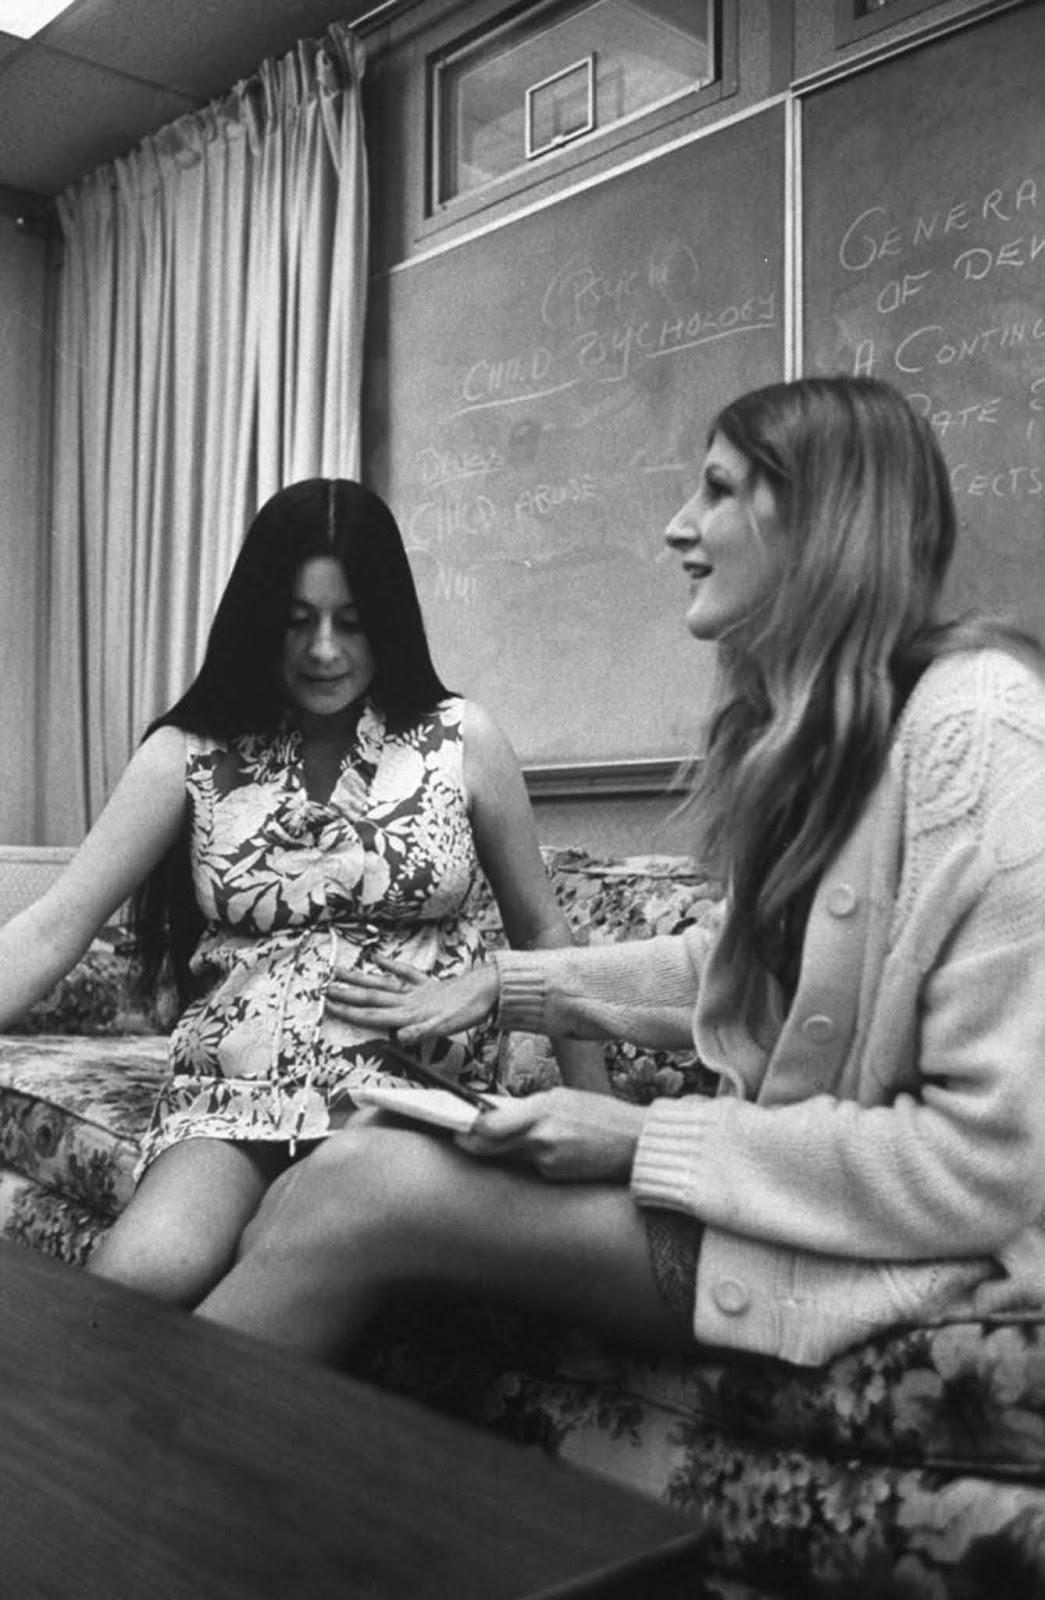 teen_pregnancy_1970s (5).jpg